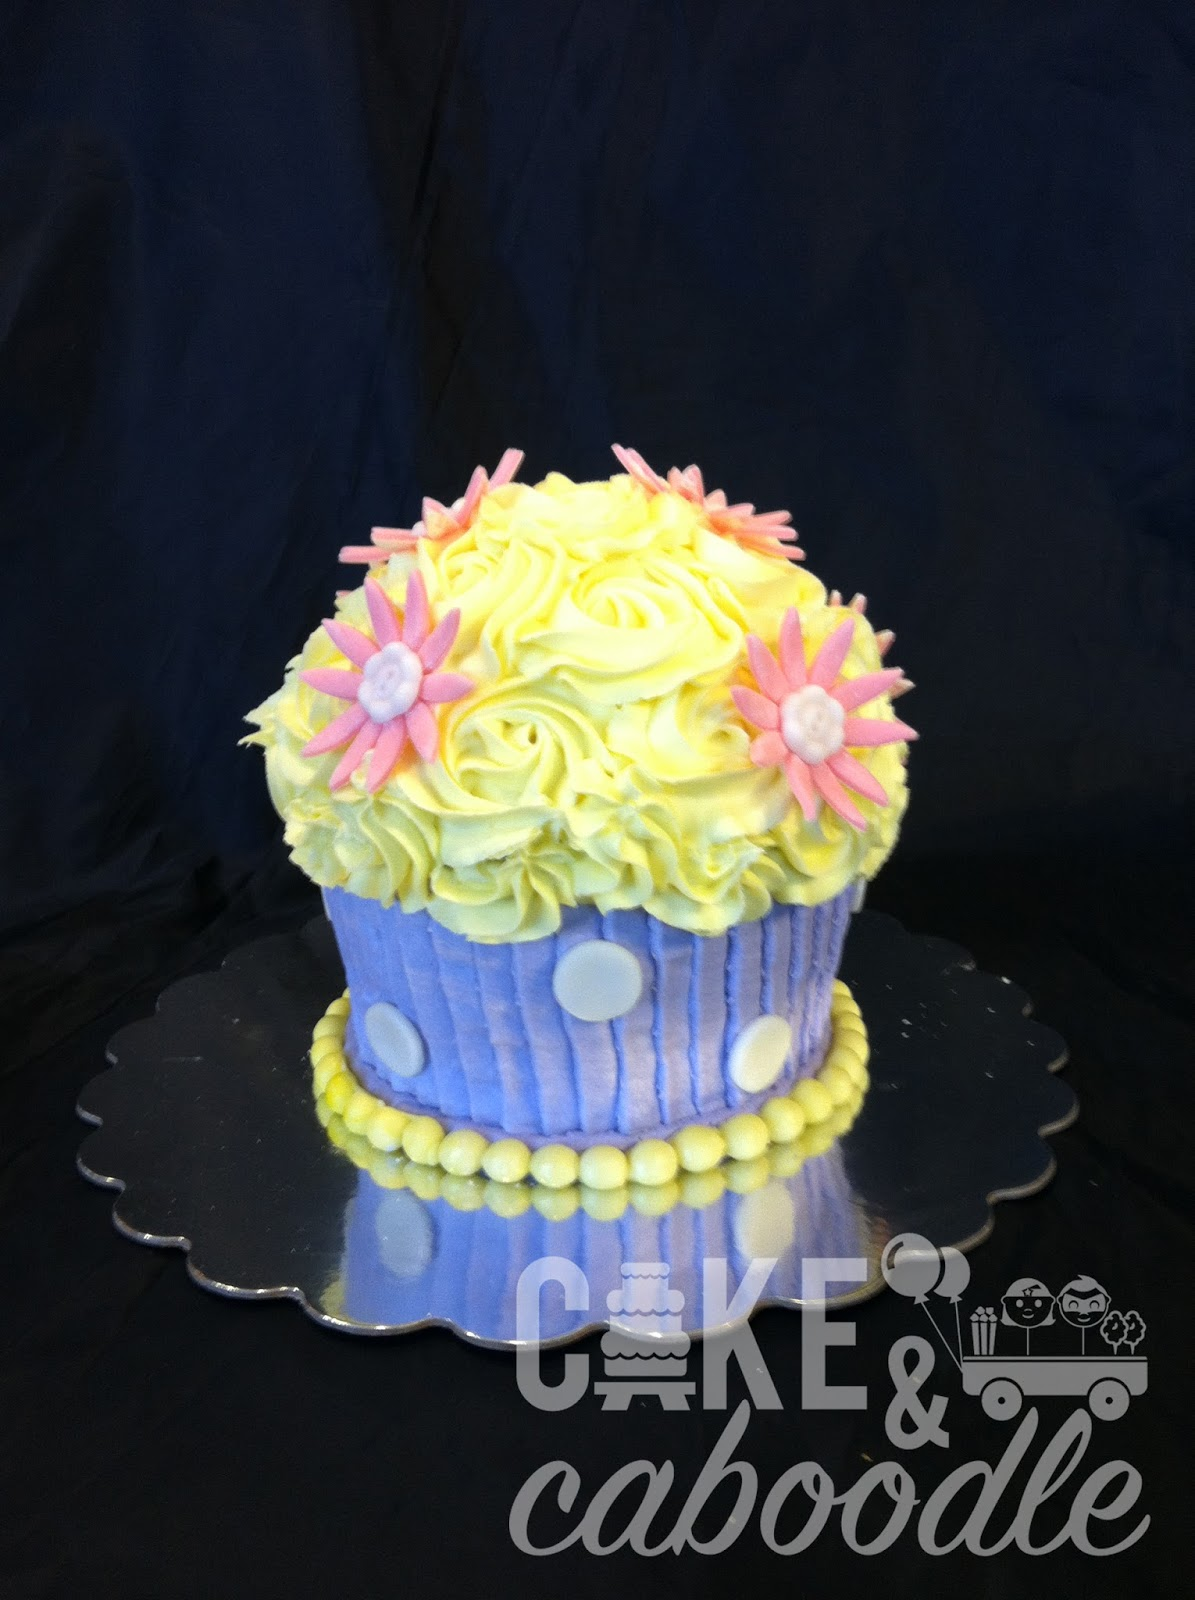 cupcake smash cake cake and caboodle